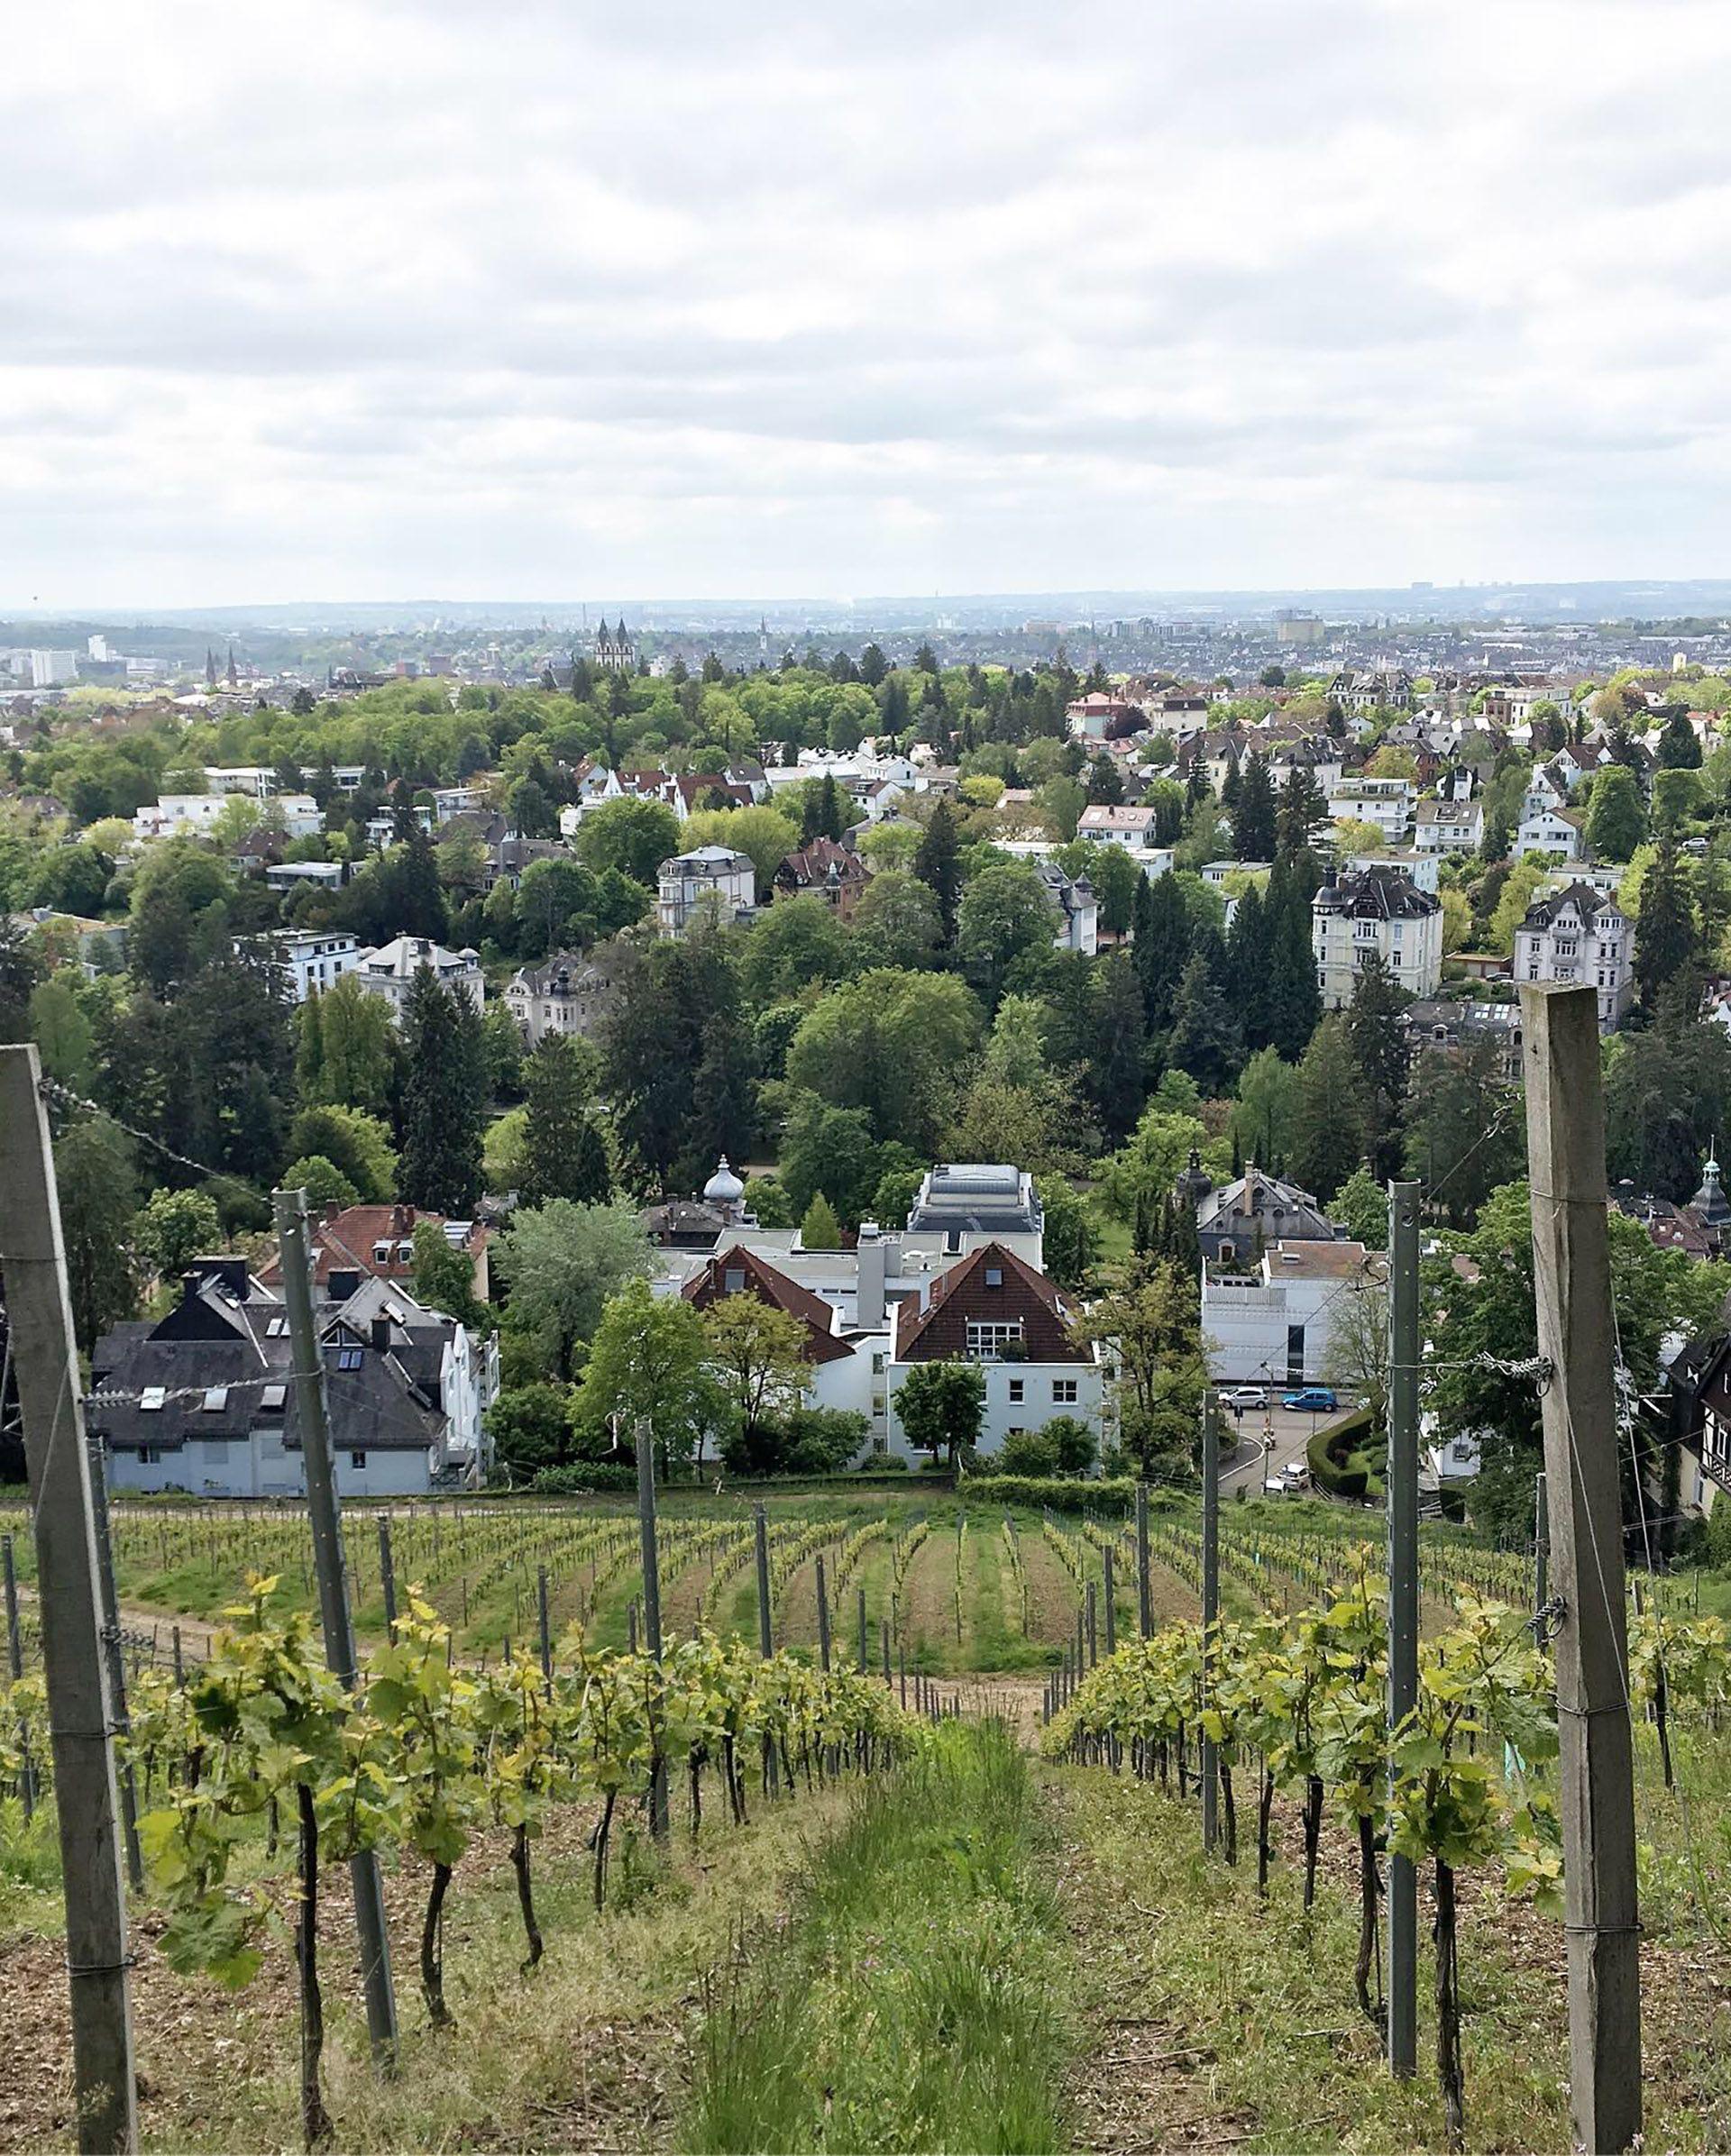 Vista de un viñedo en Hesse